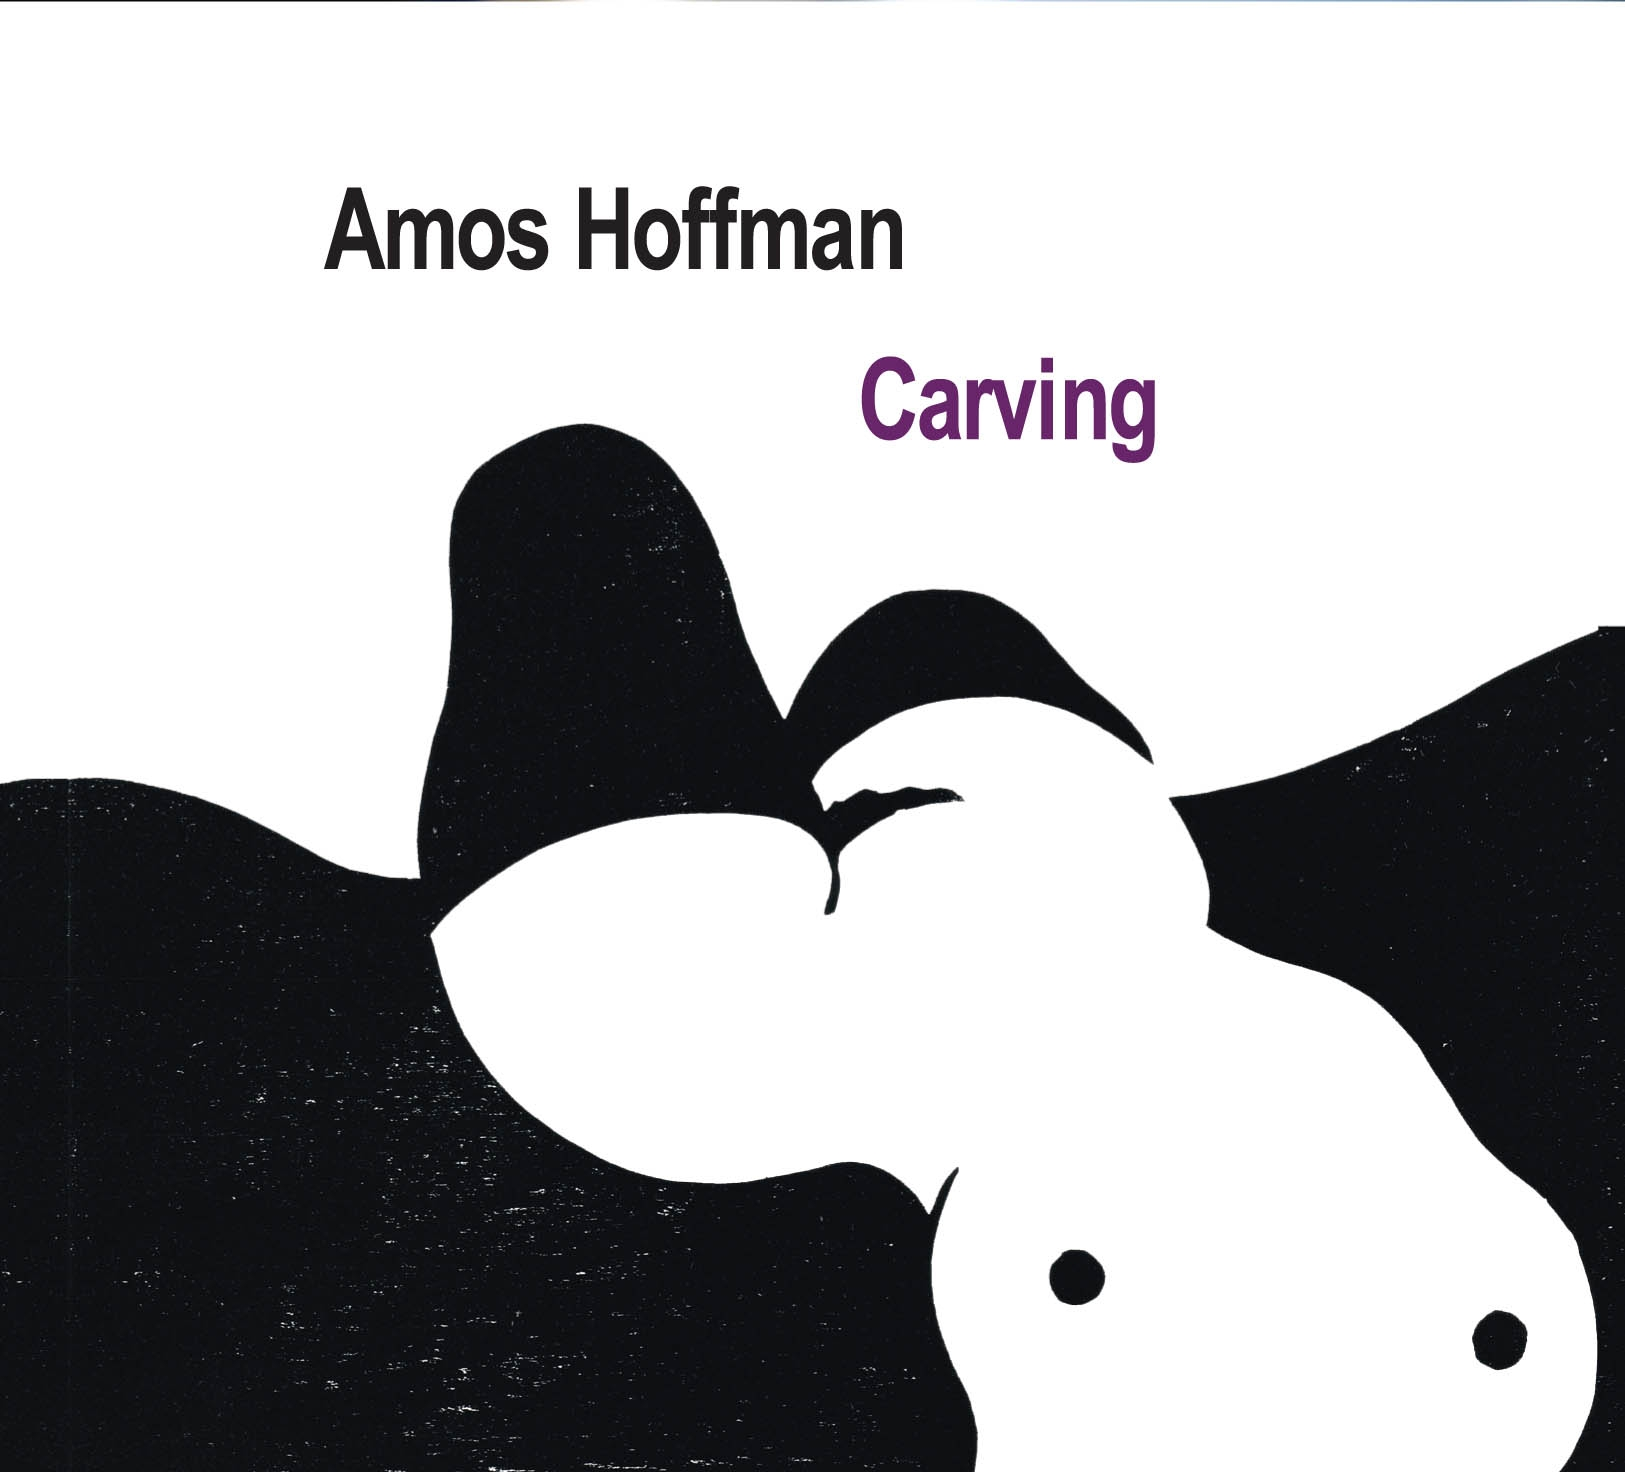 Amos Hoffman: Carving